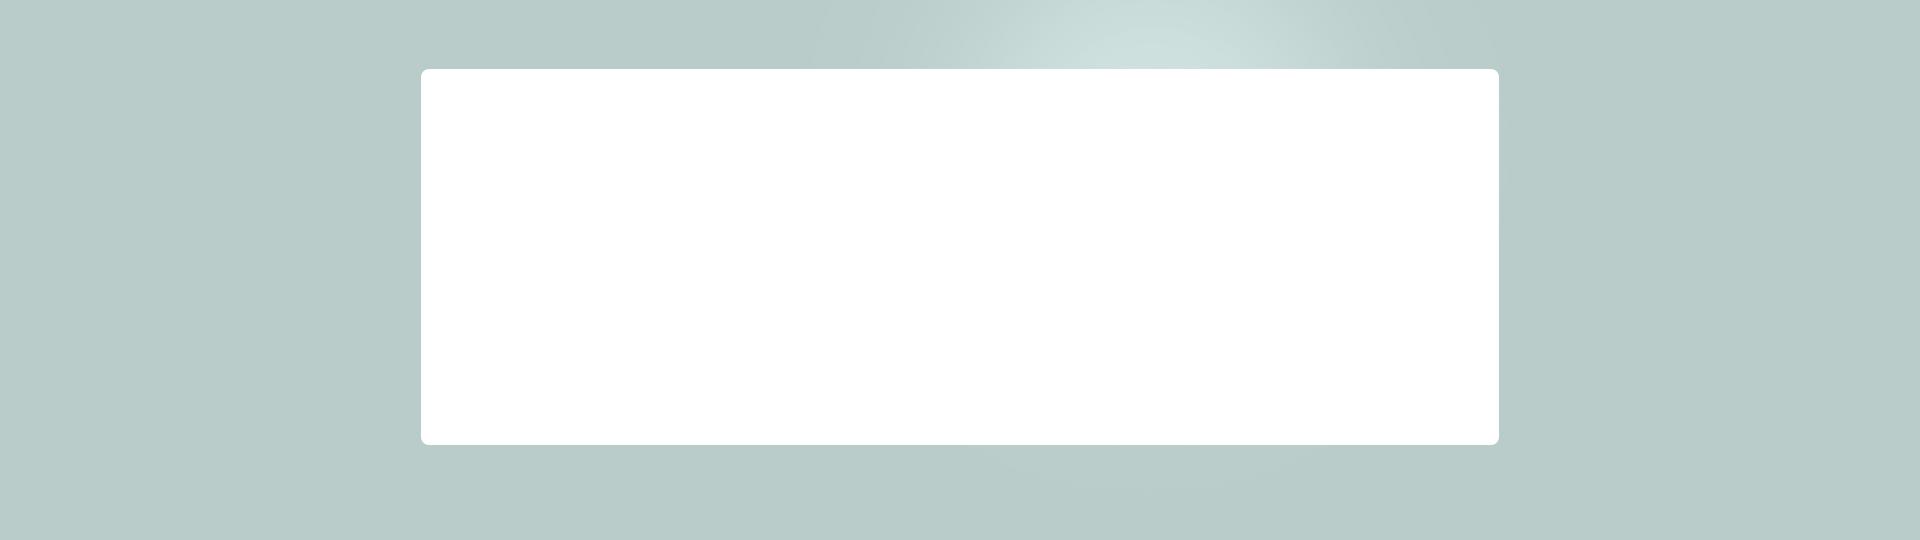 CATEGORY-MDA-VESTFROSTANINDAINDIRIM-BP-09-10